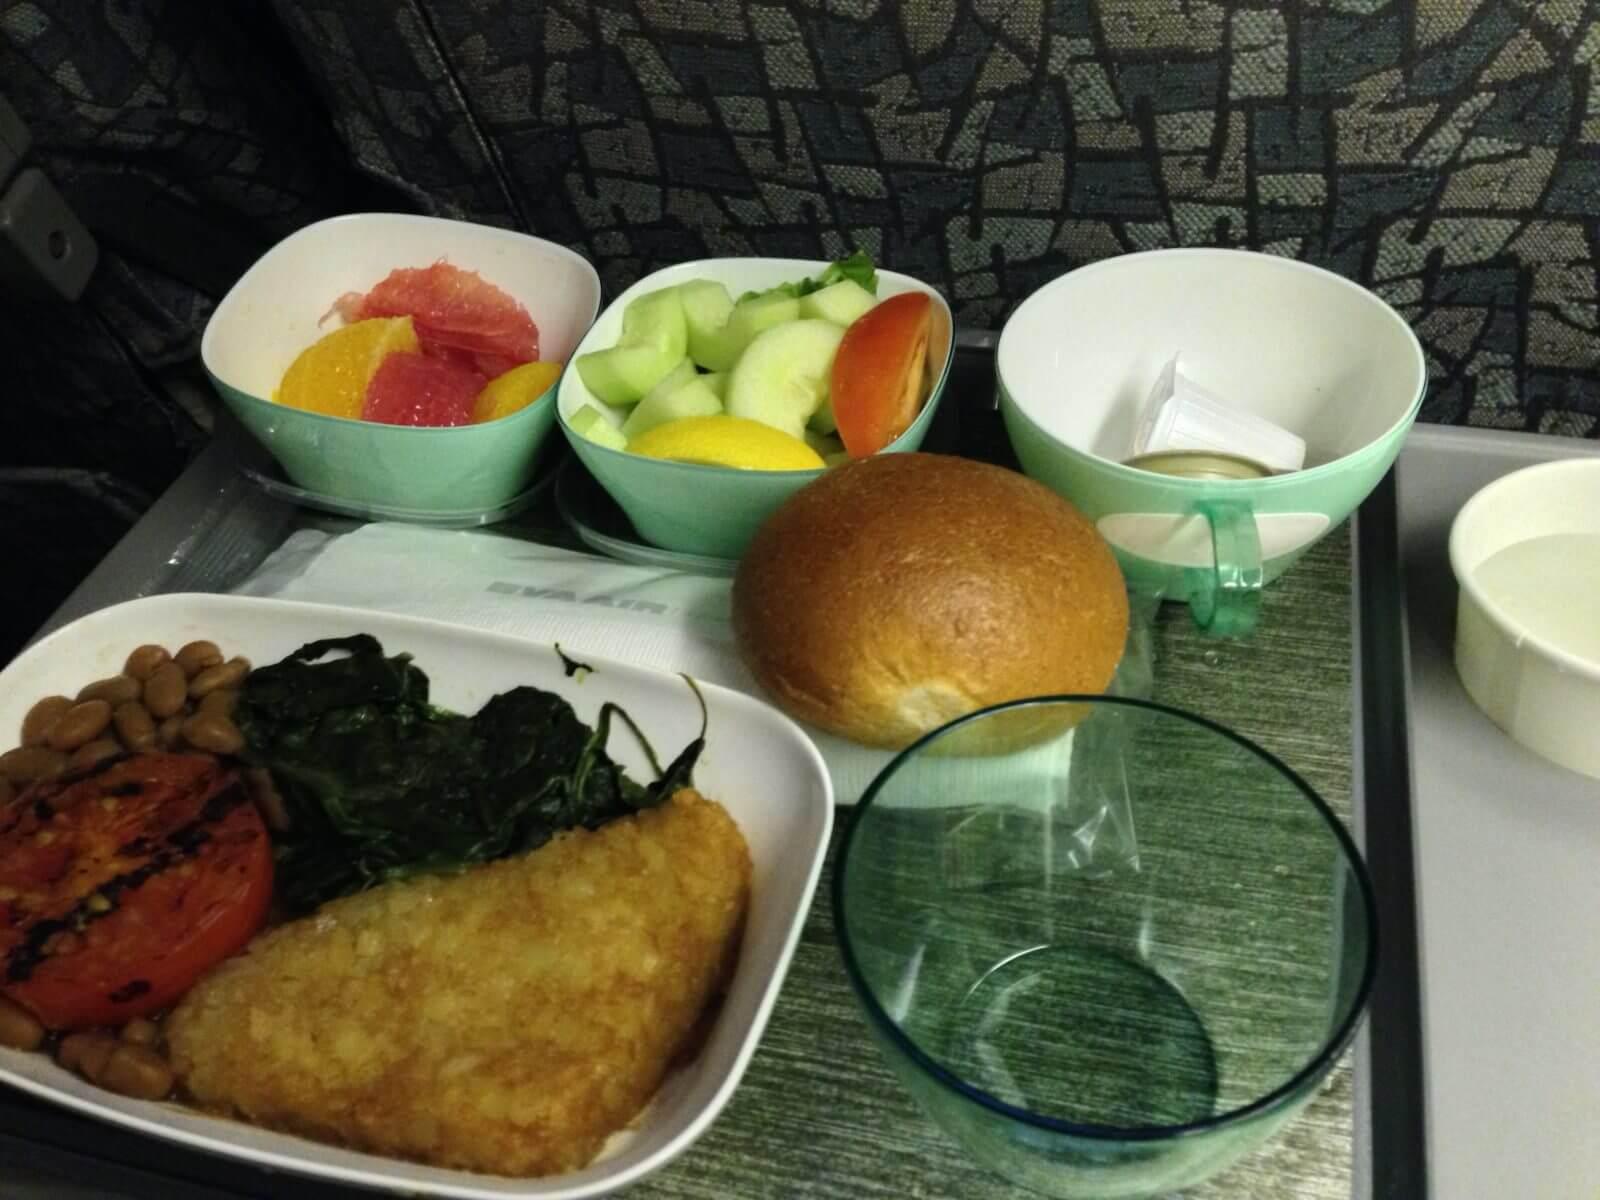 Airline Food: Why You Should ALWAYS Choose Vegetarian Option!